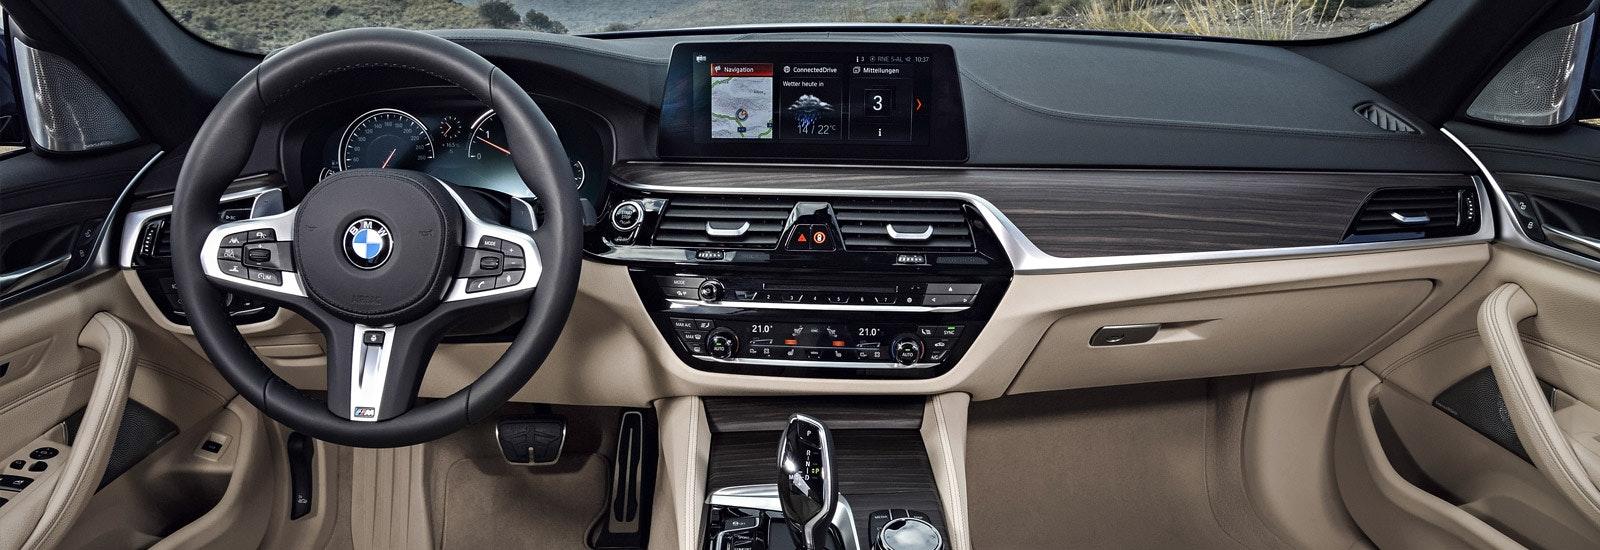 Brz Sti 2018 Price >> 2018 Gmc Interior - New Car Release Date and Review 2018 | Amanda Felicia